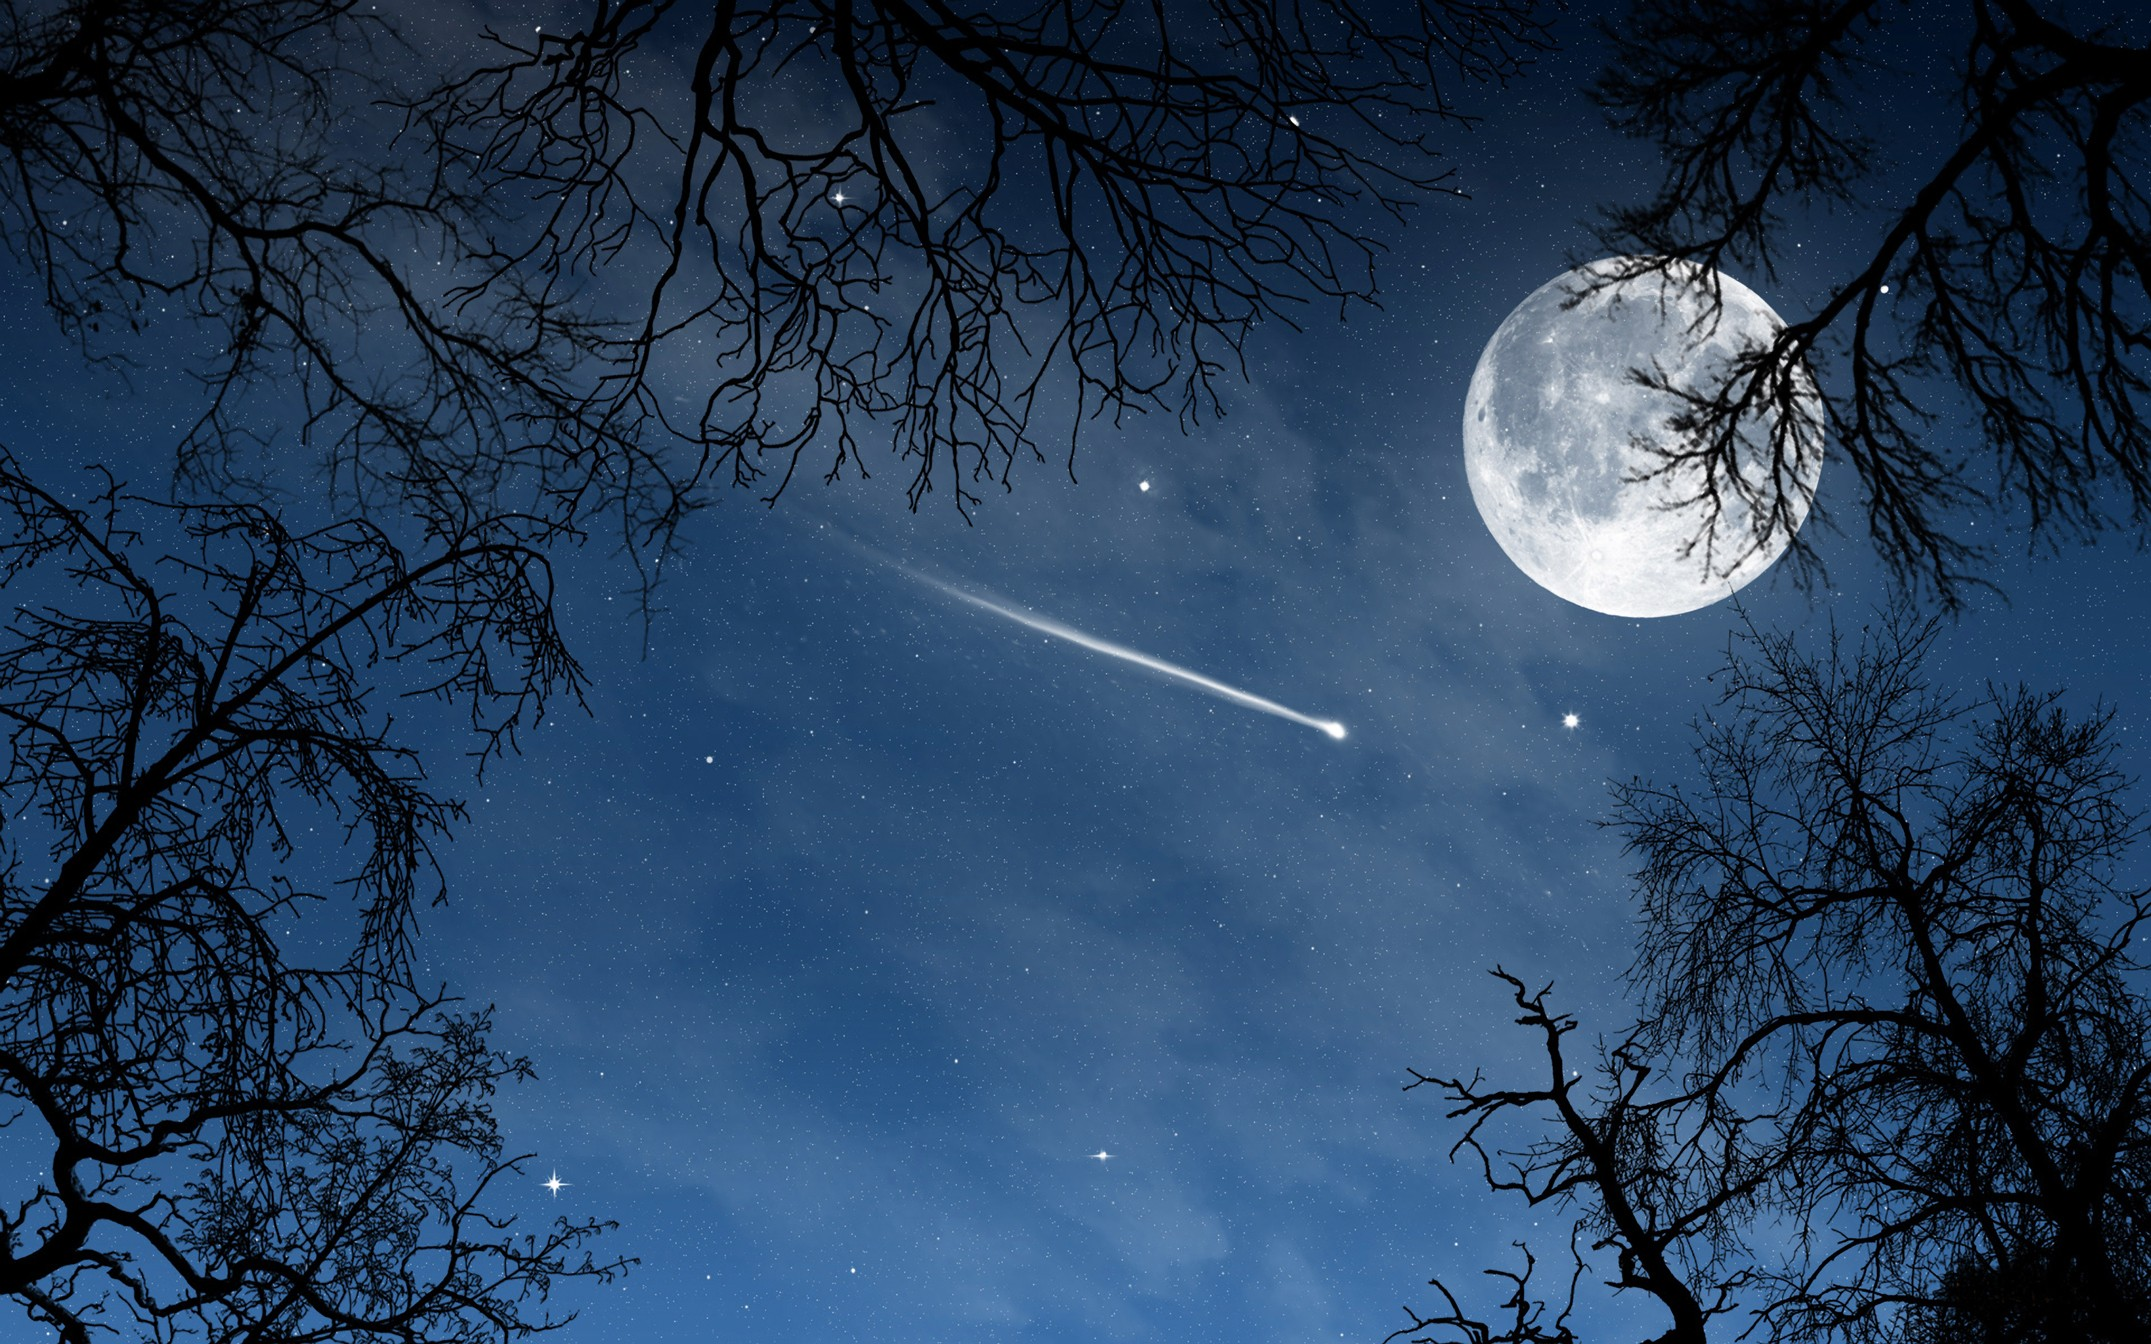 La luna llena y un cometa - 2151x1344